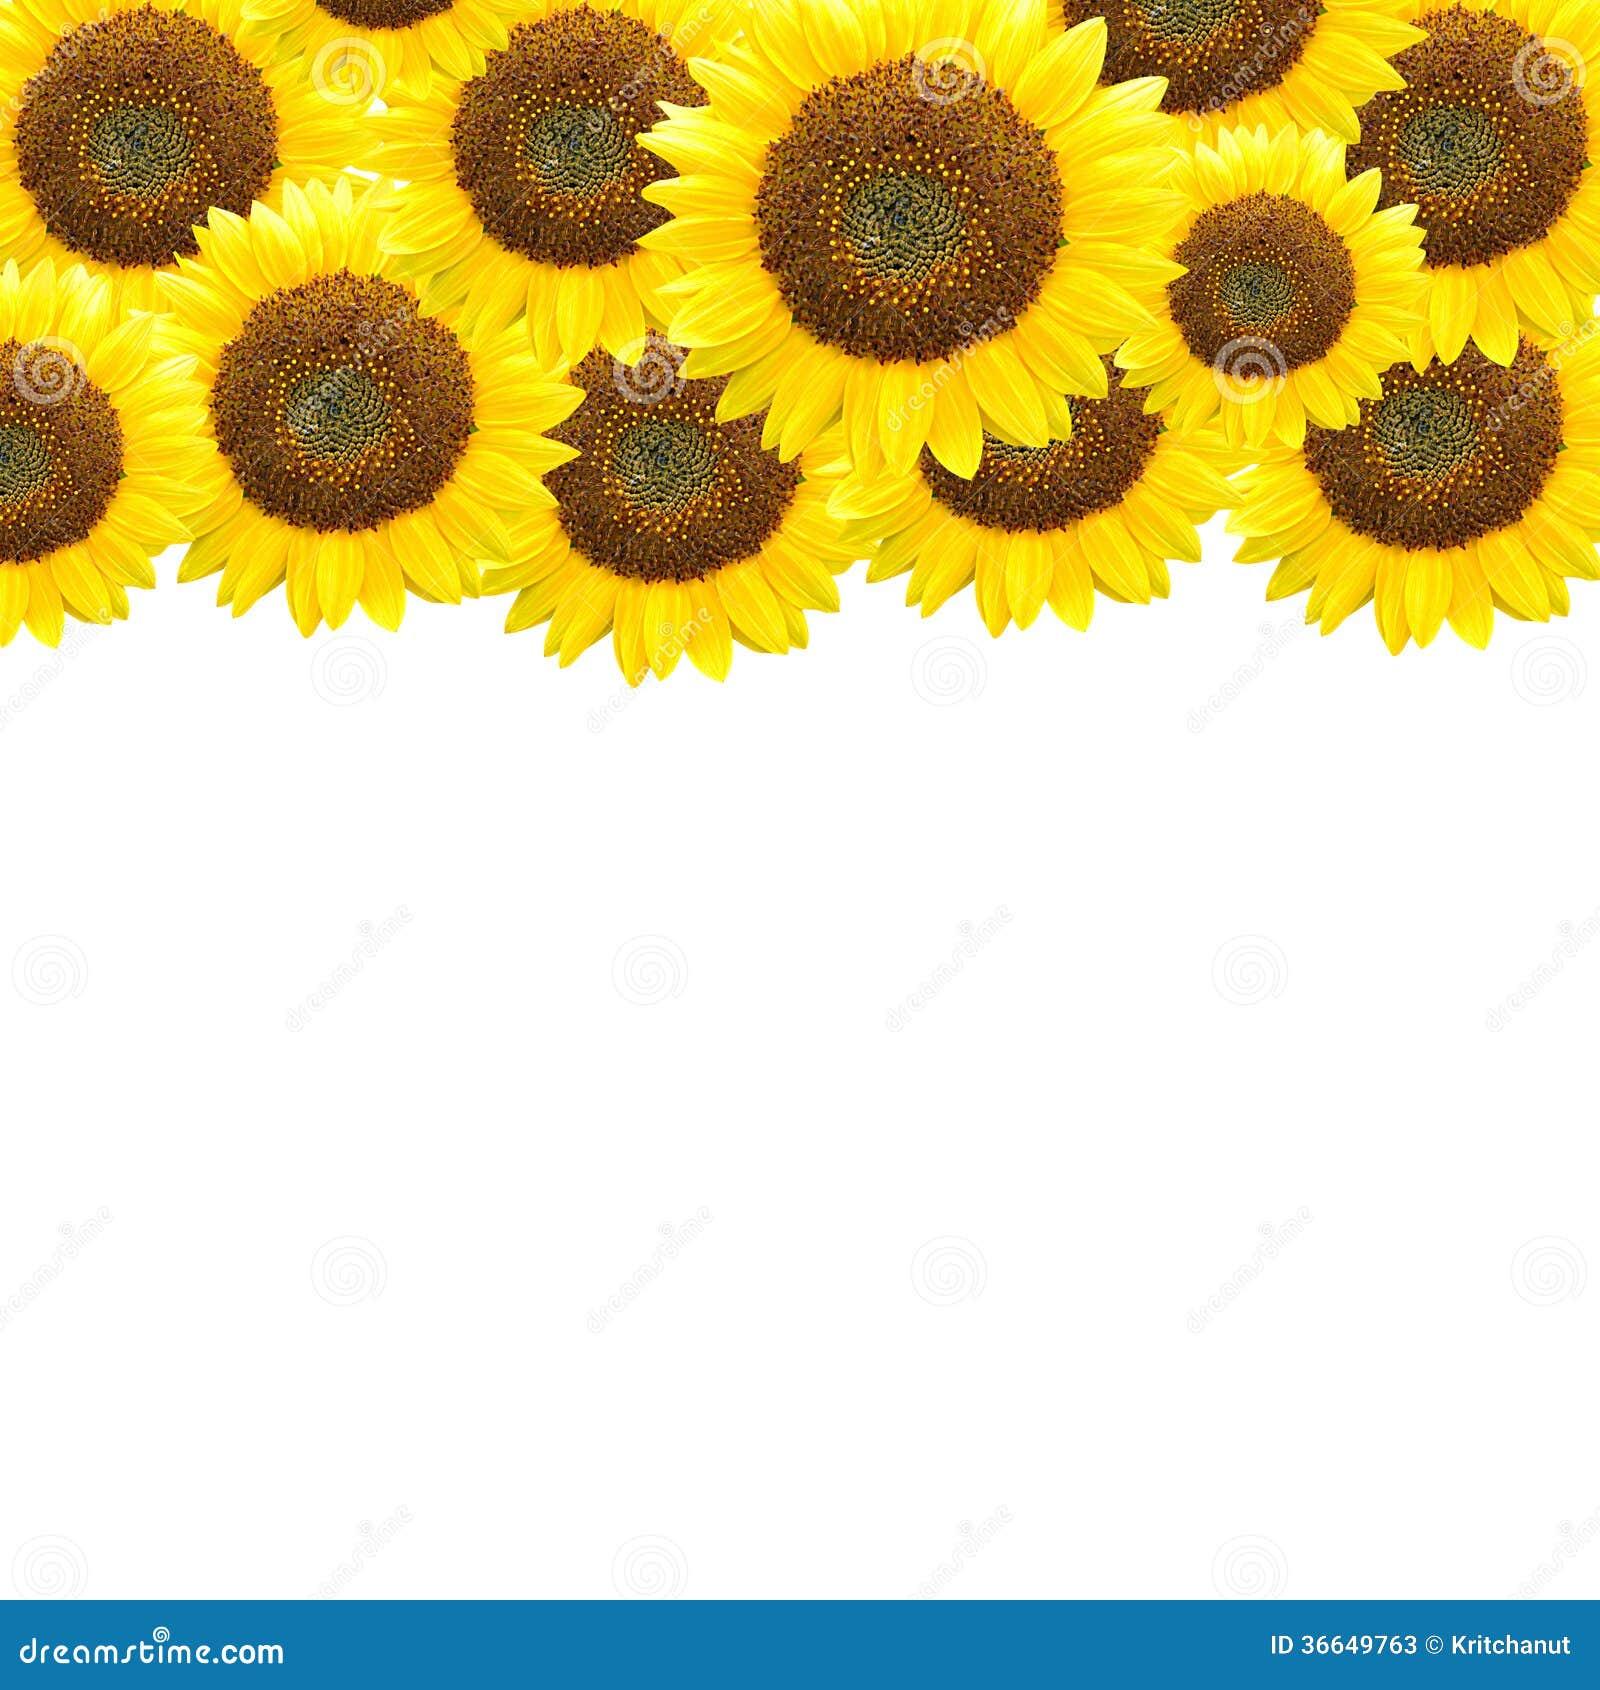 Sunflowers - Border Design Stock Photos - Image: 36649763